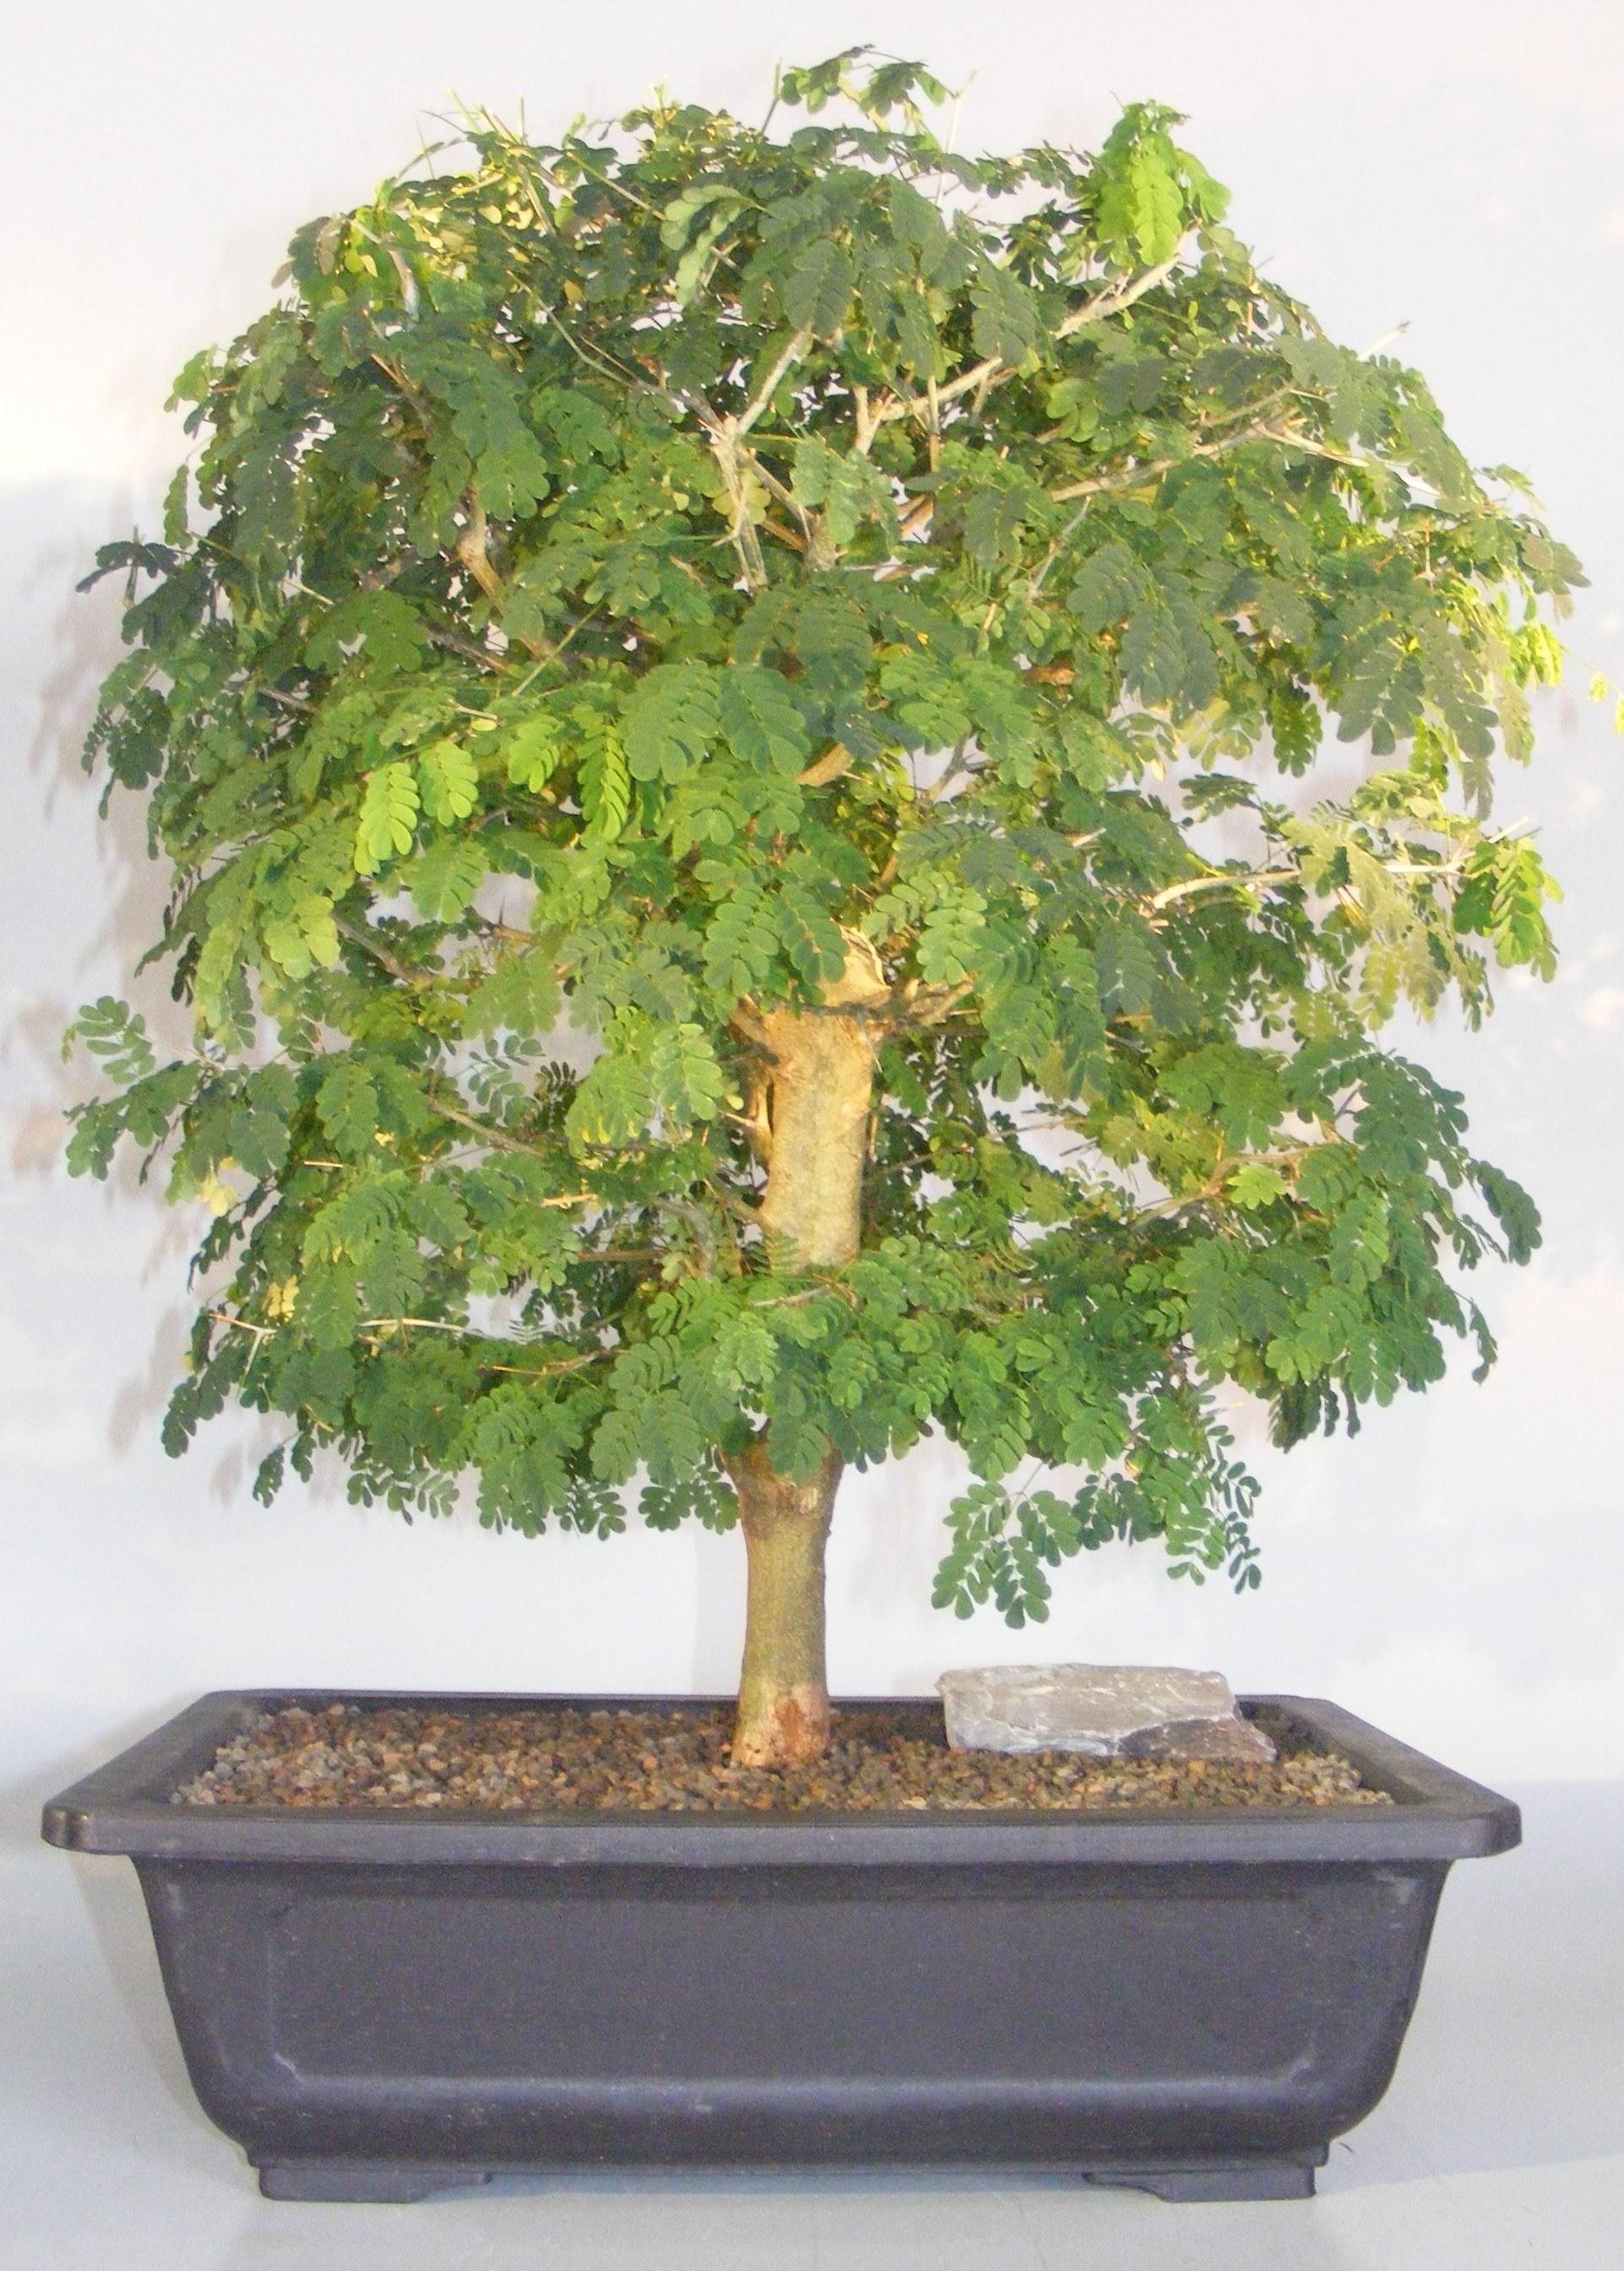 Flowering Brazilian Raintree Bonsai Tree (pithecellobium tortum) Image